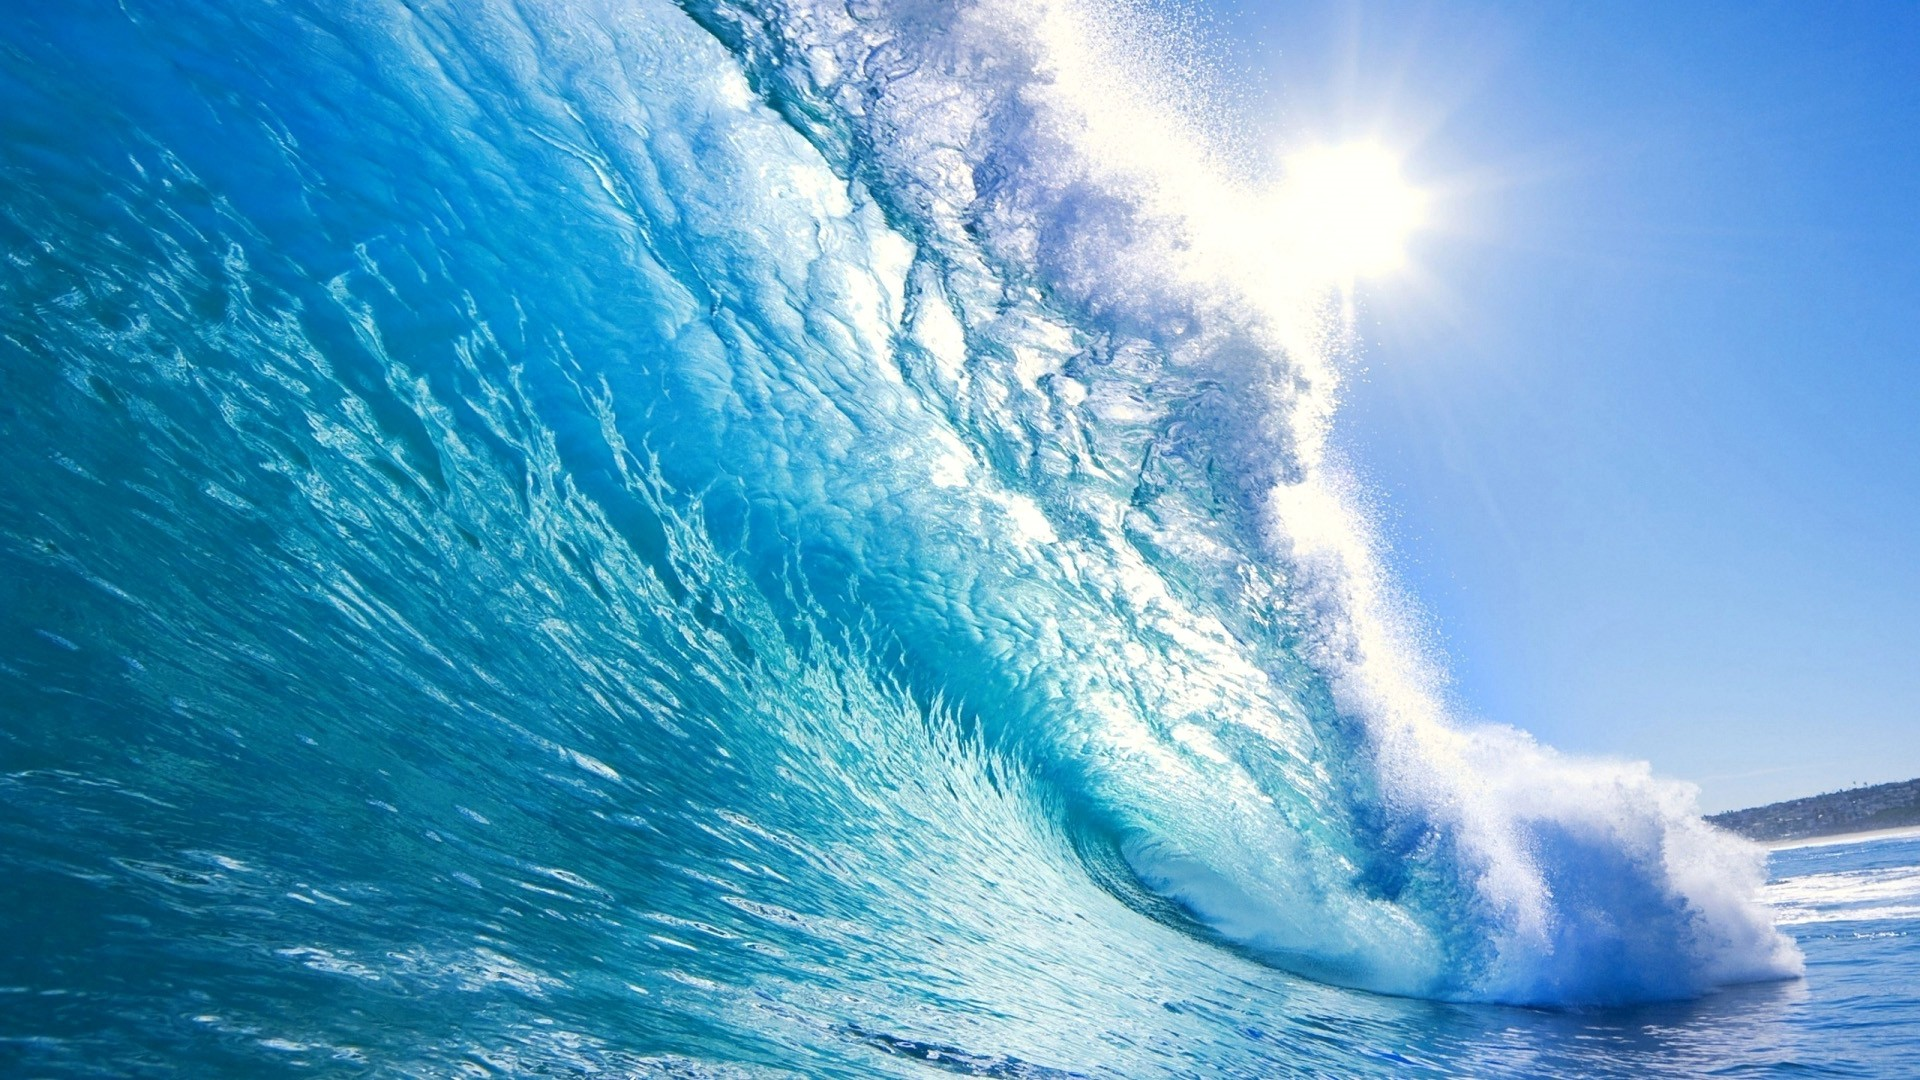 Ocean Nature Desktop wallpaper